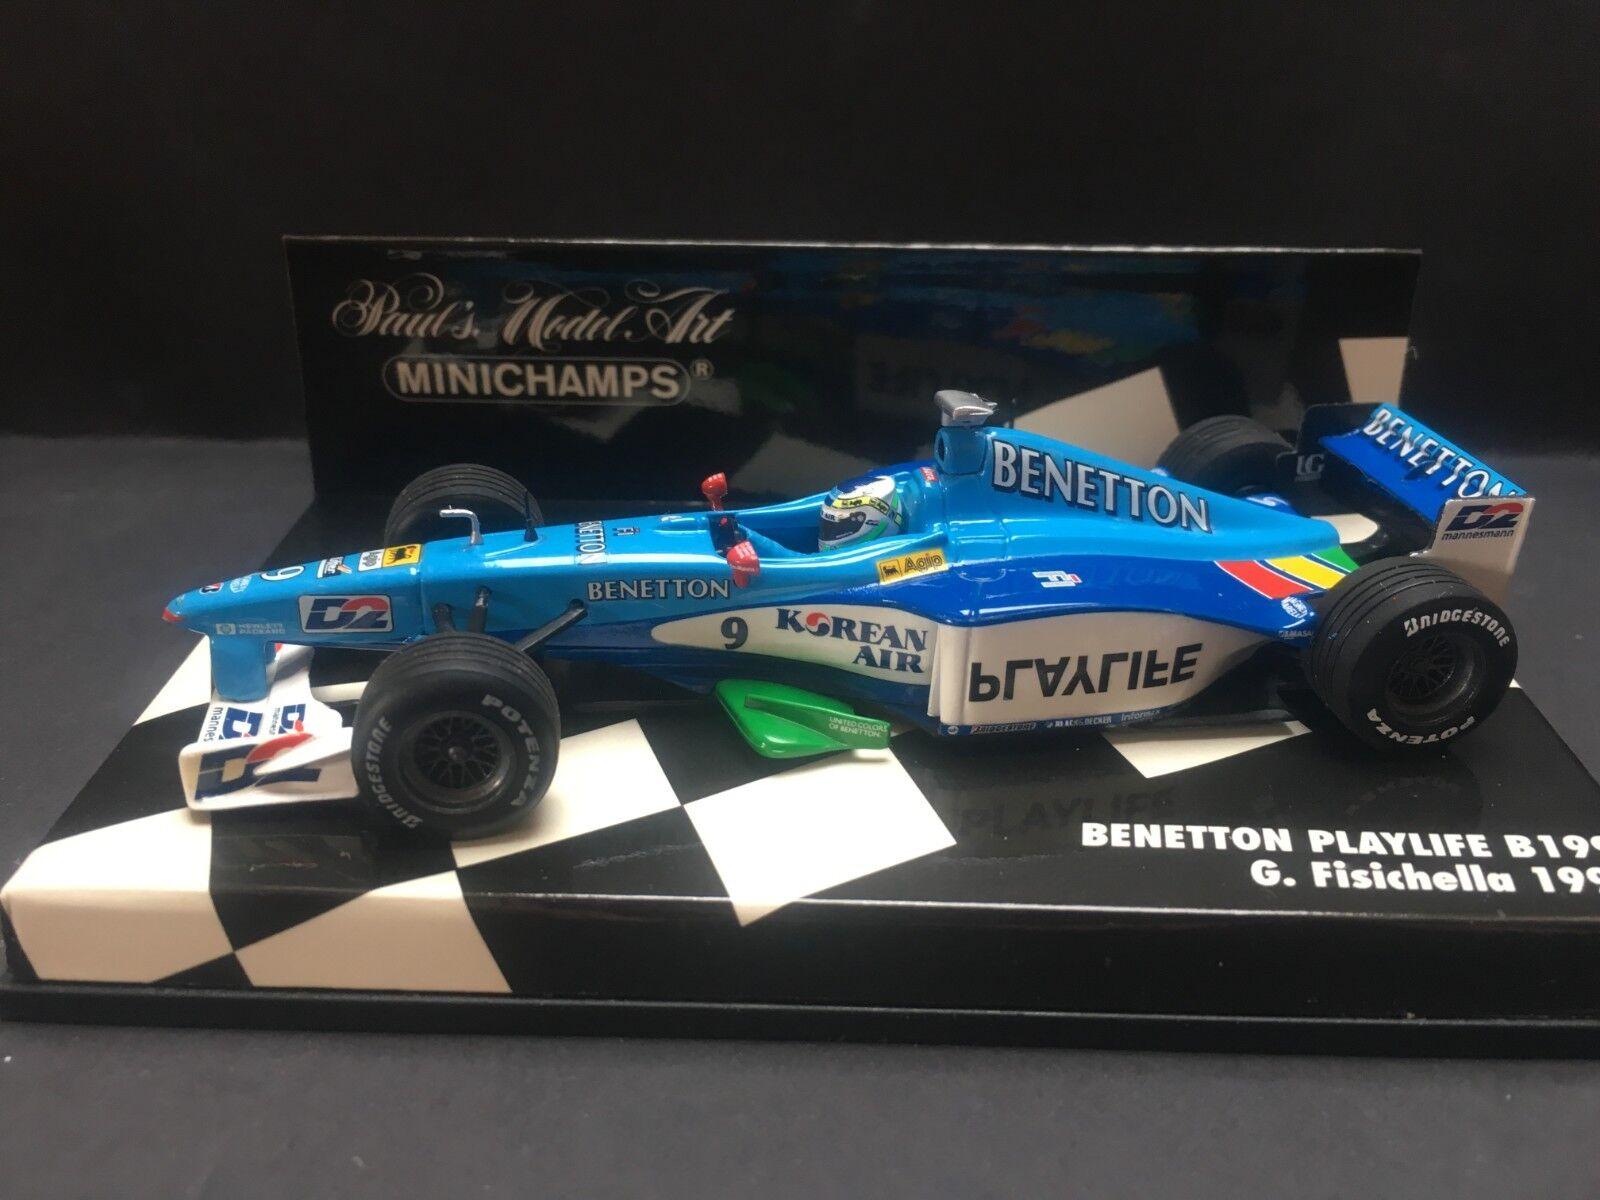 Minichamps - Giancarlo Fisichella - Benetton - B199 -  1 43 - 1999